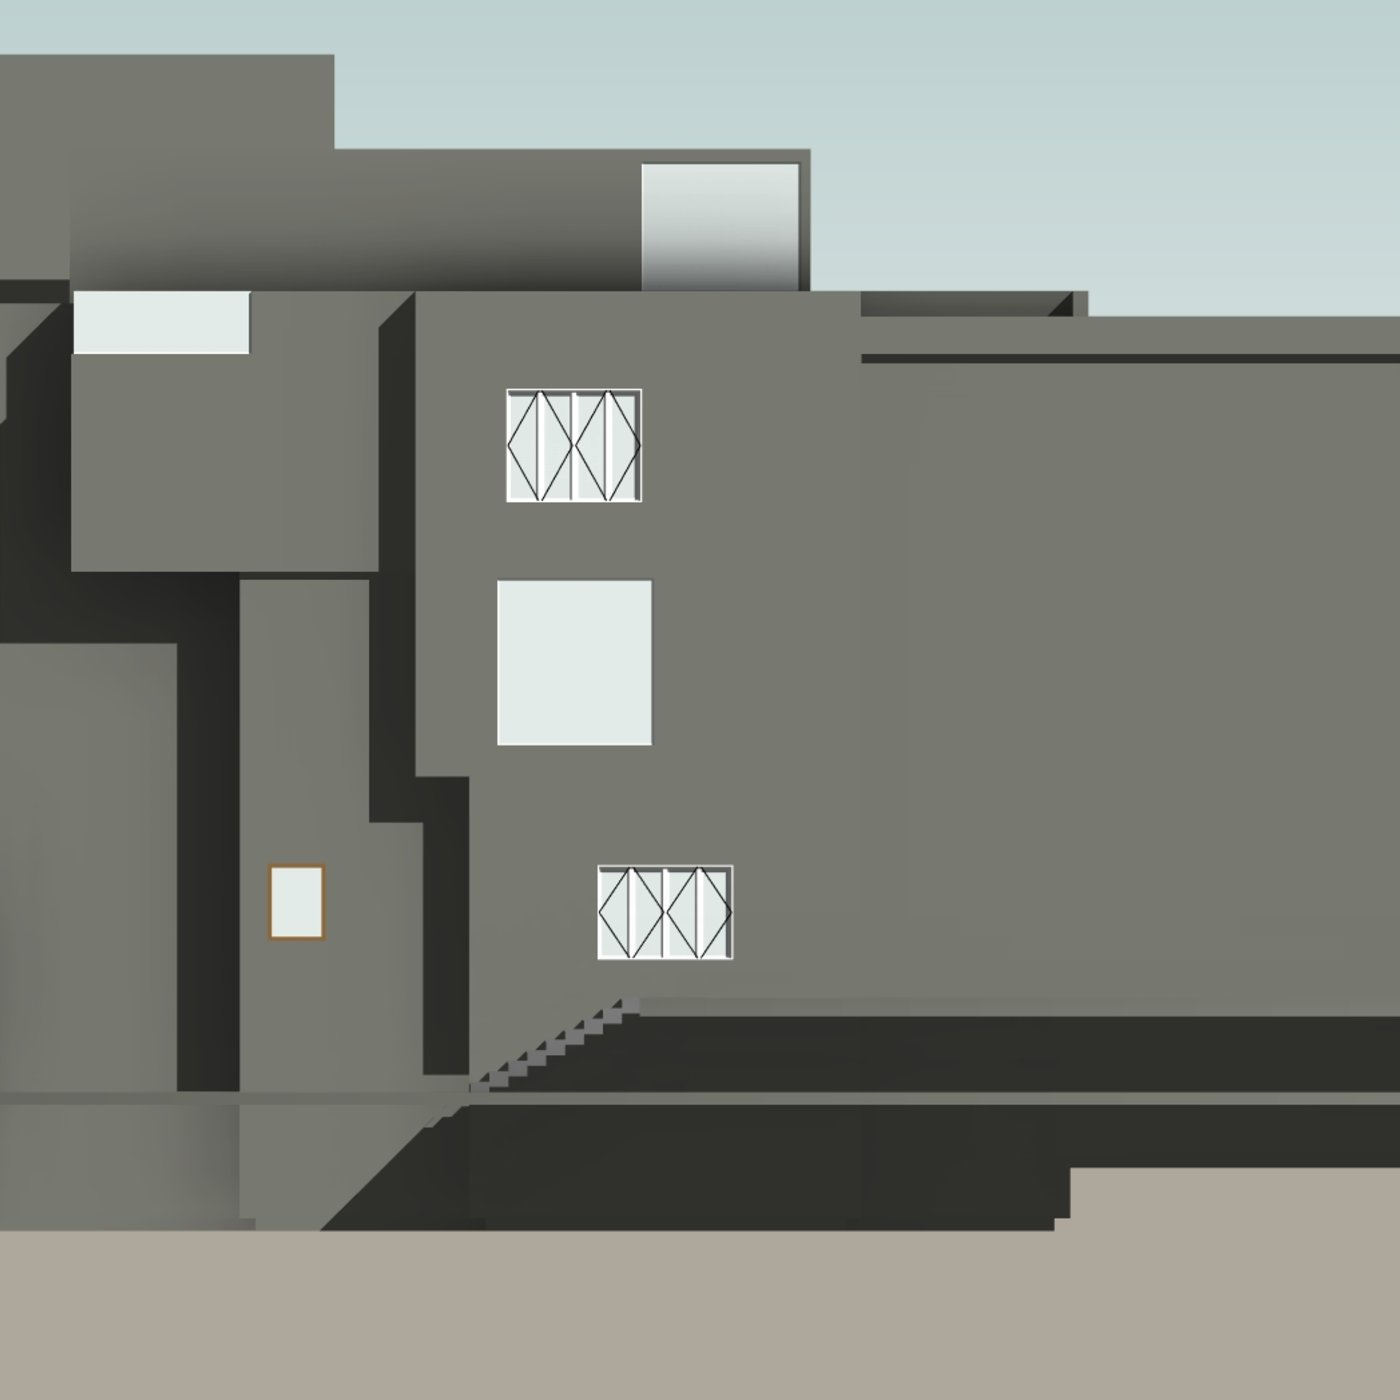 Large villa sketches